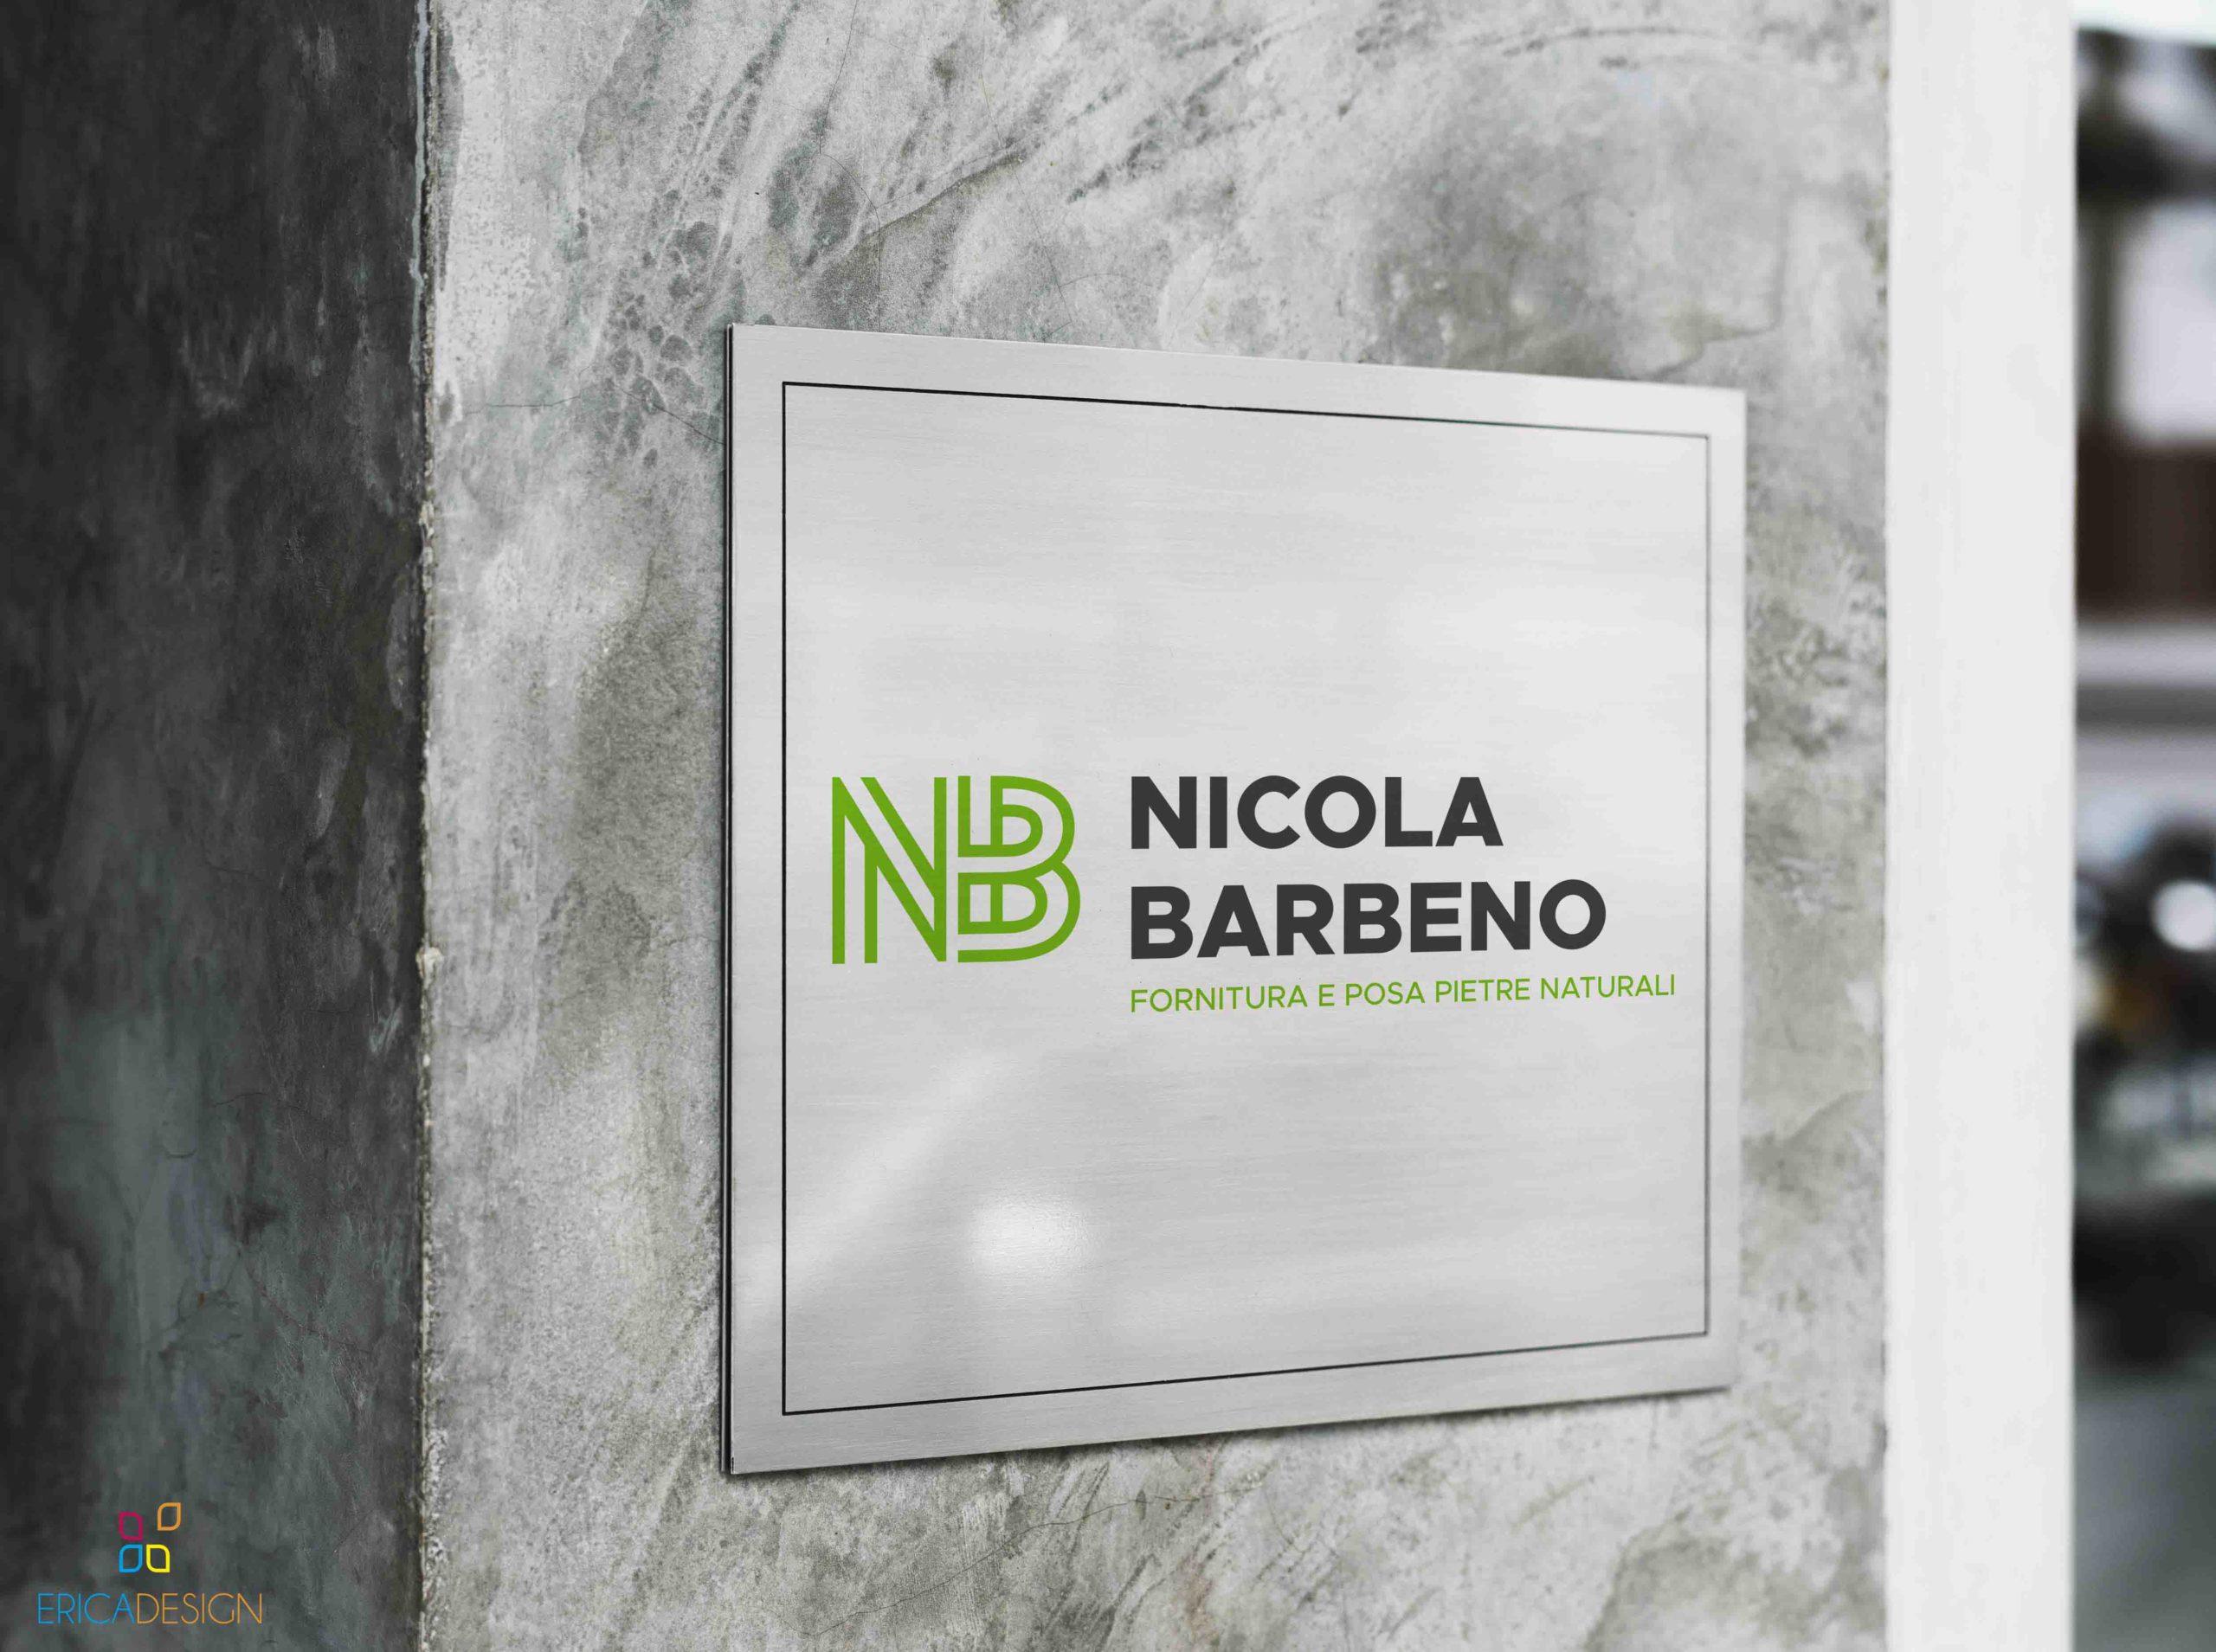 Targa creata per Nicola Barbeno a Brescia